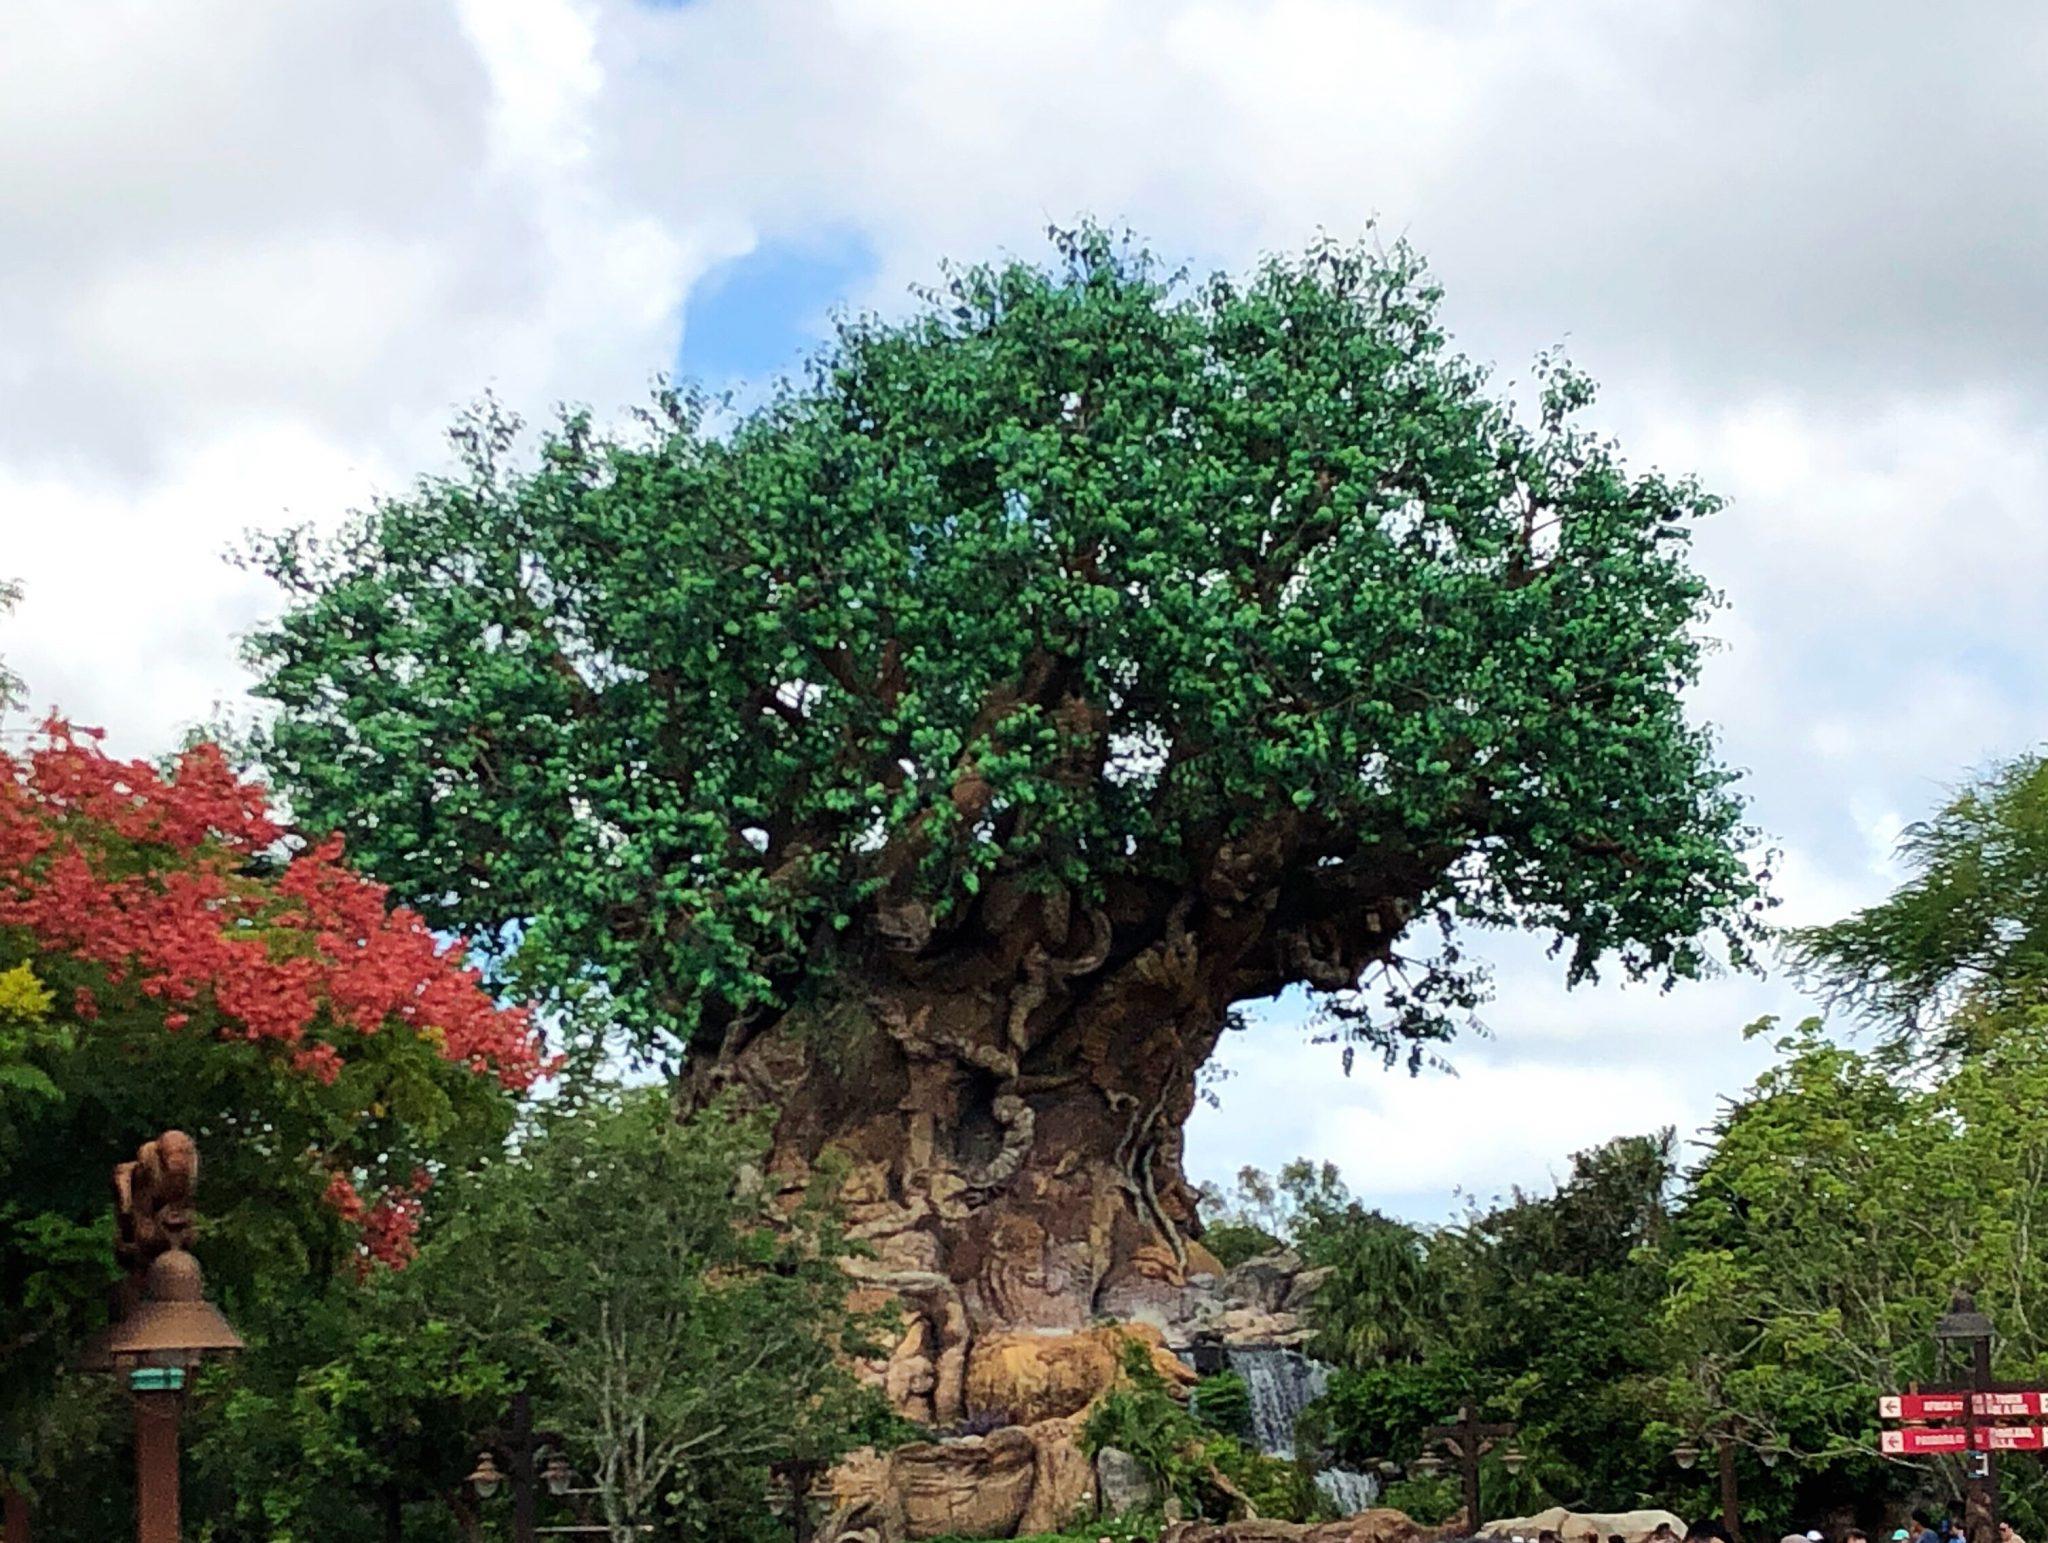 A Twentysomething's Guide to Walt Disney World: Animal Kingdom | herlifeinruins